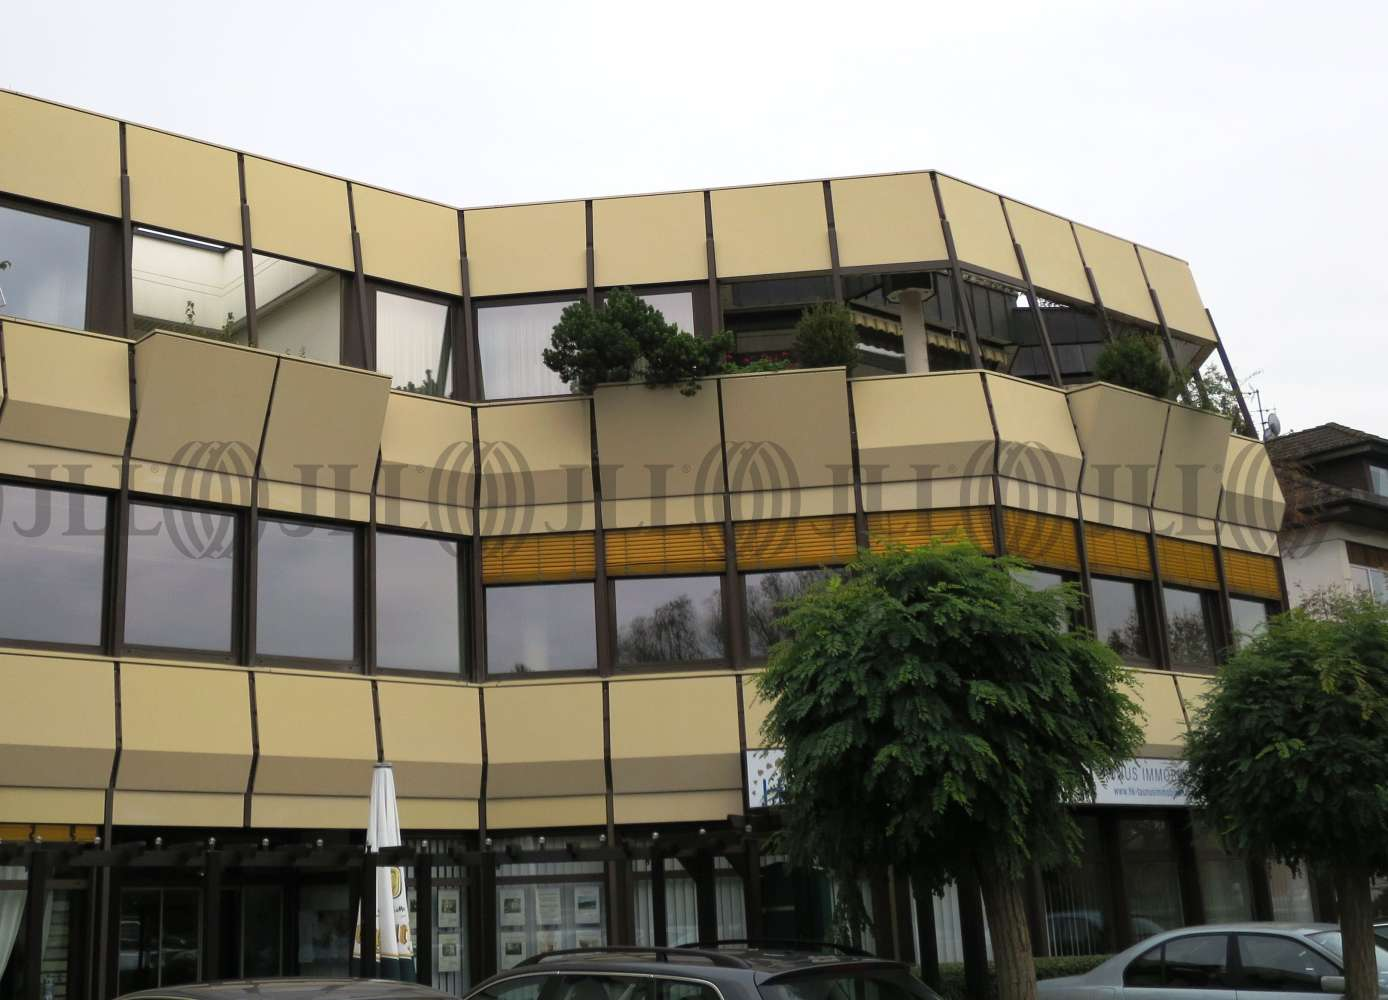 Büros Kelkheim (taunus), 65779 - Büro - Kelkheim (Taunus), Fischbach - F0789 - 9412525